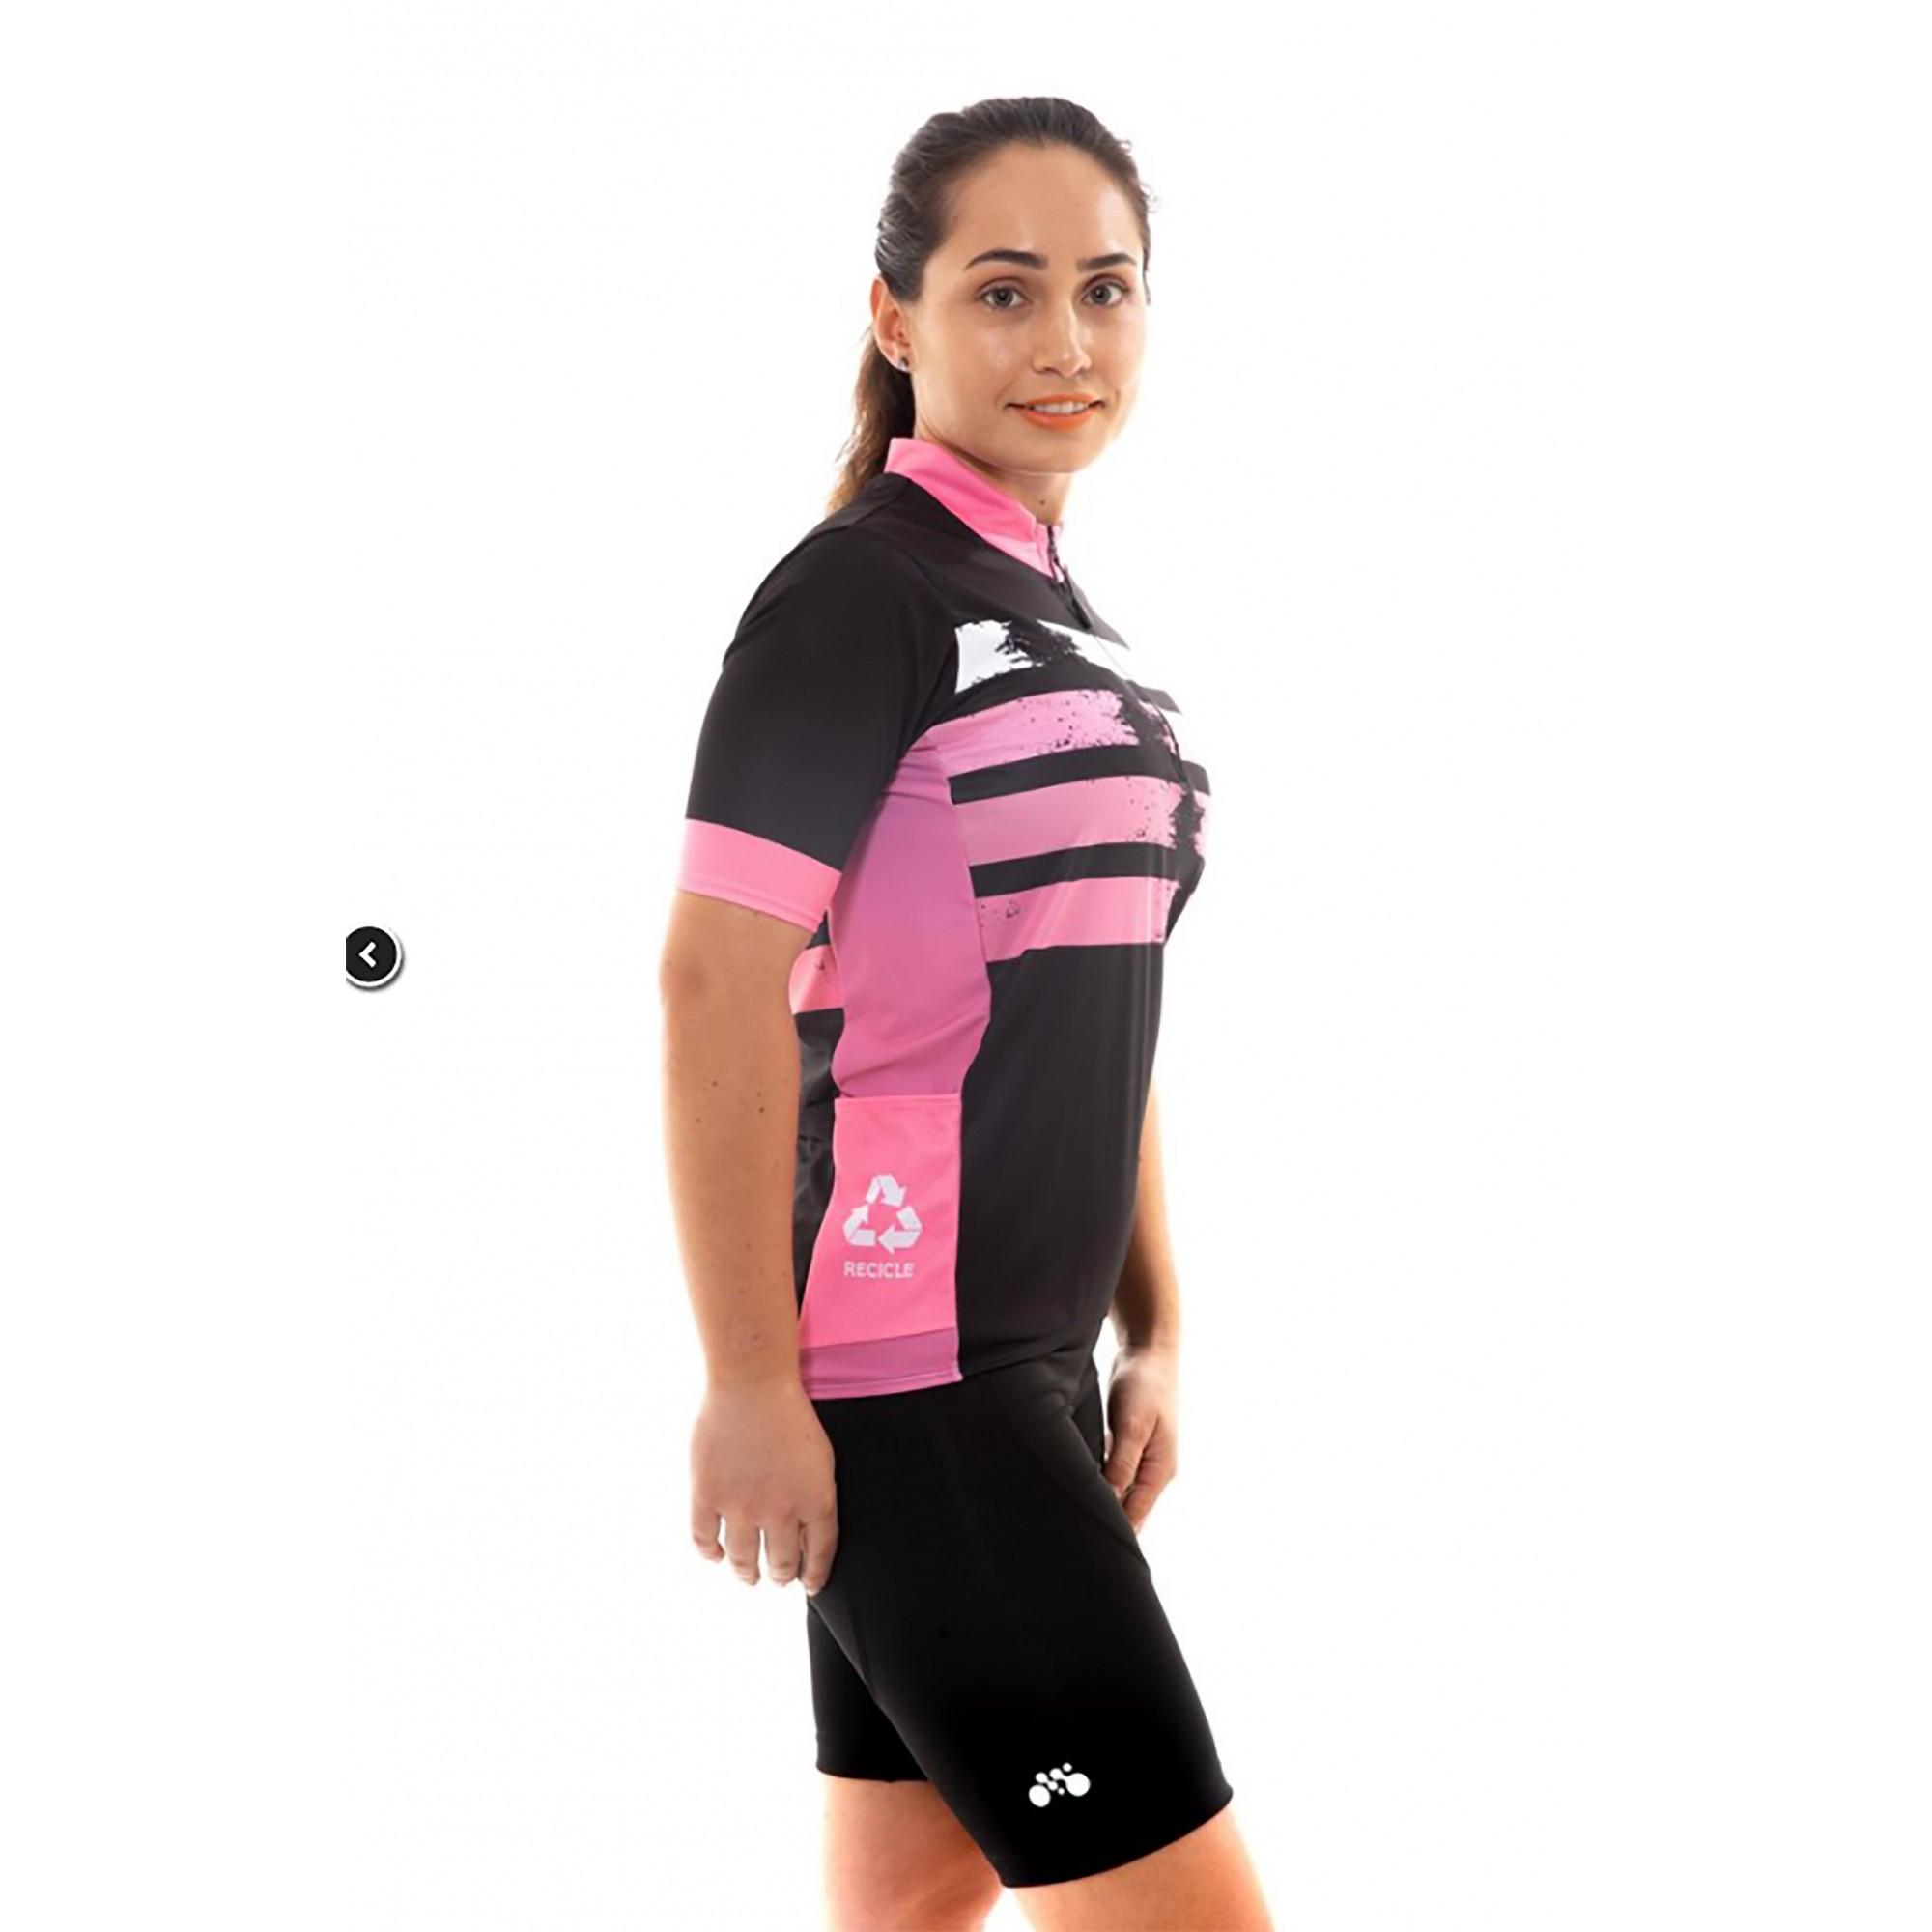 Camiseta Ciclismo Preto/rosa First - Mynd